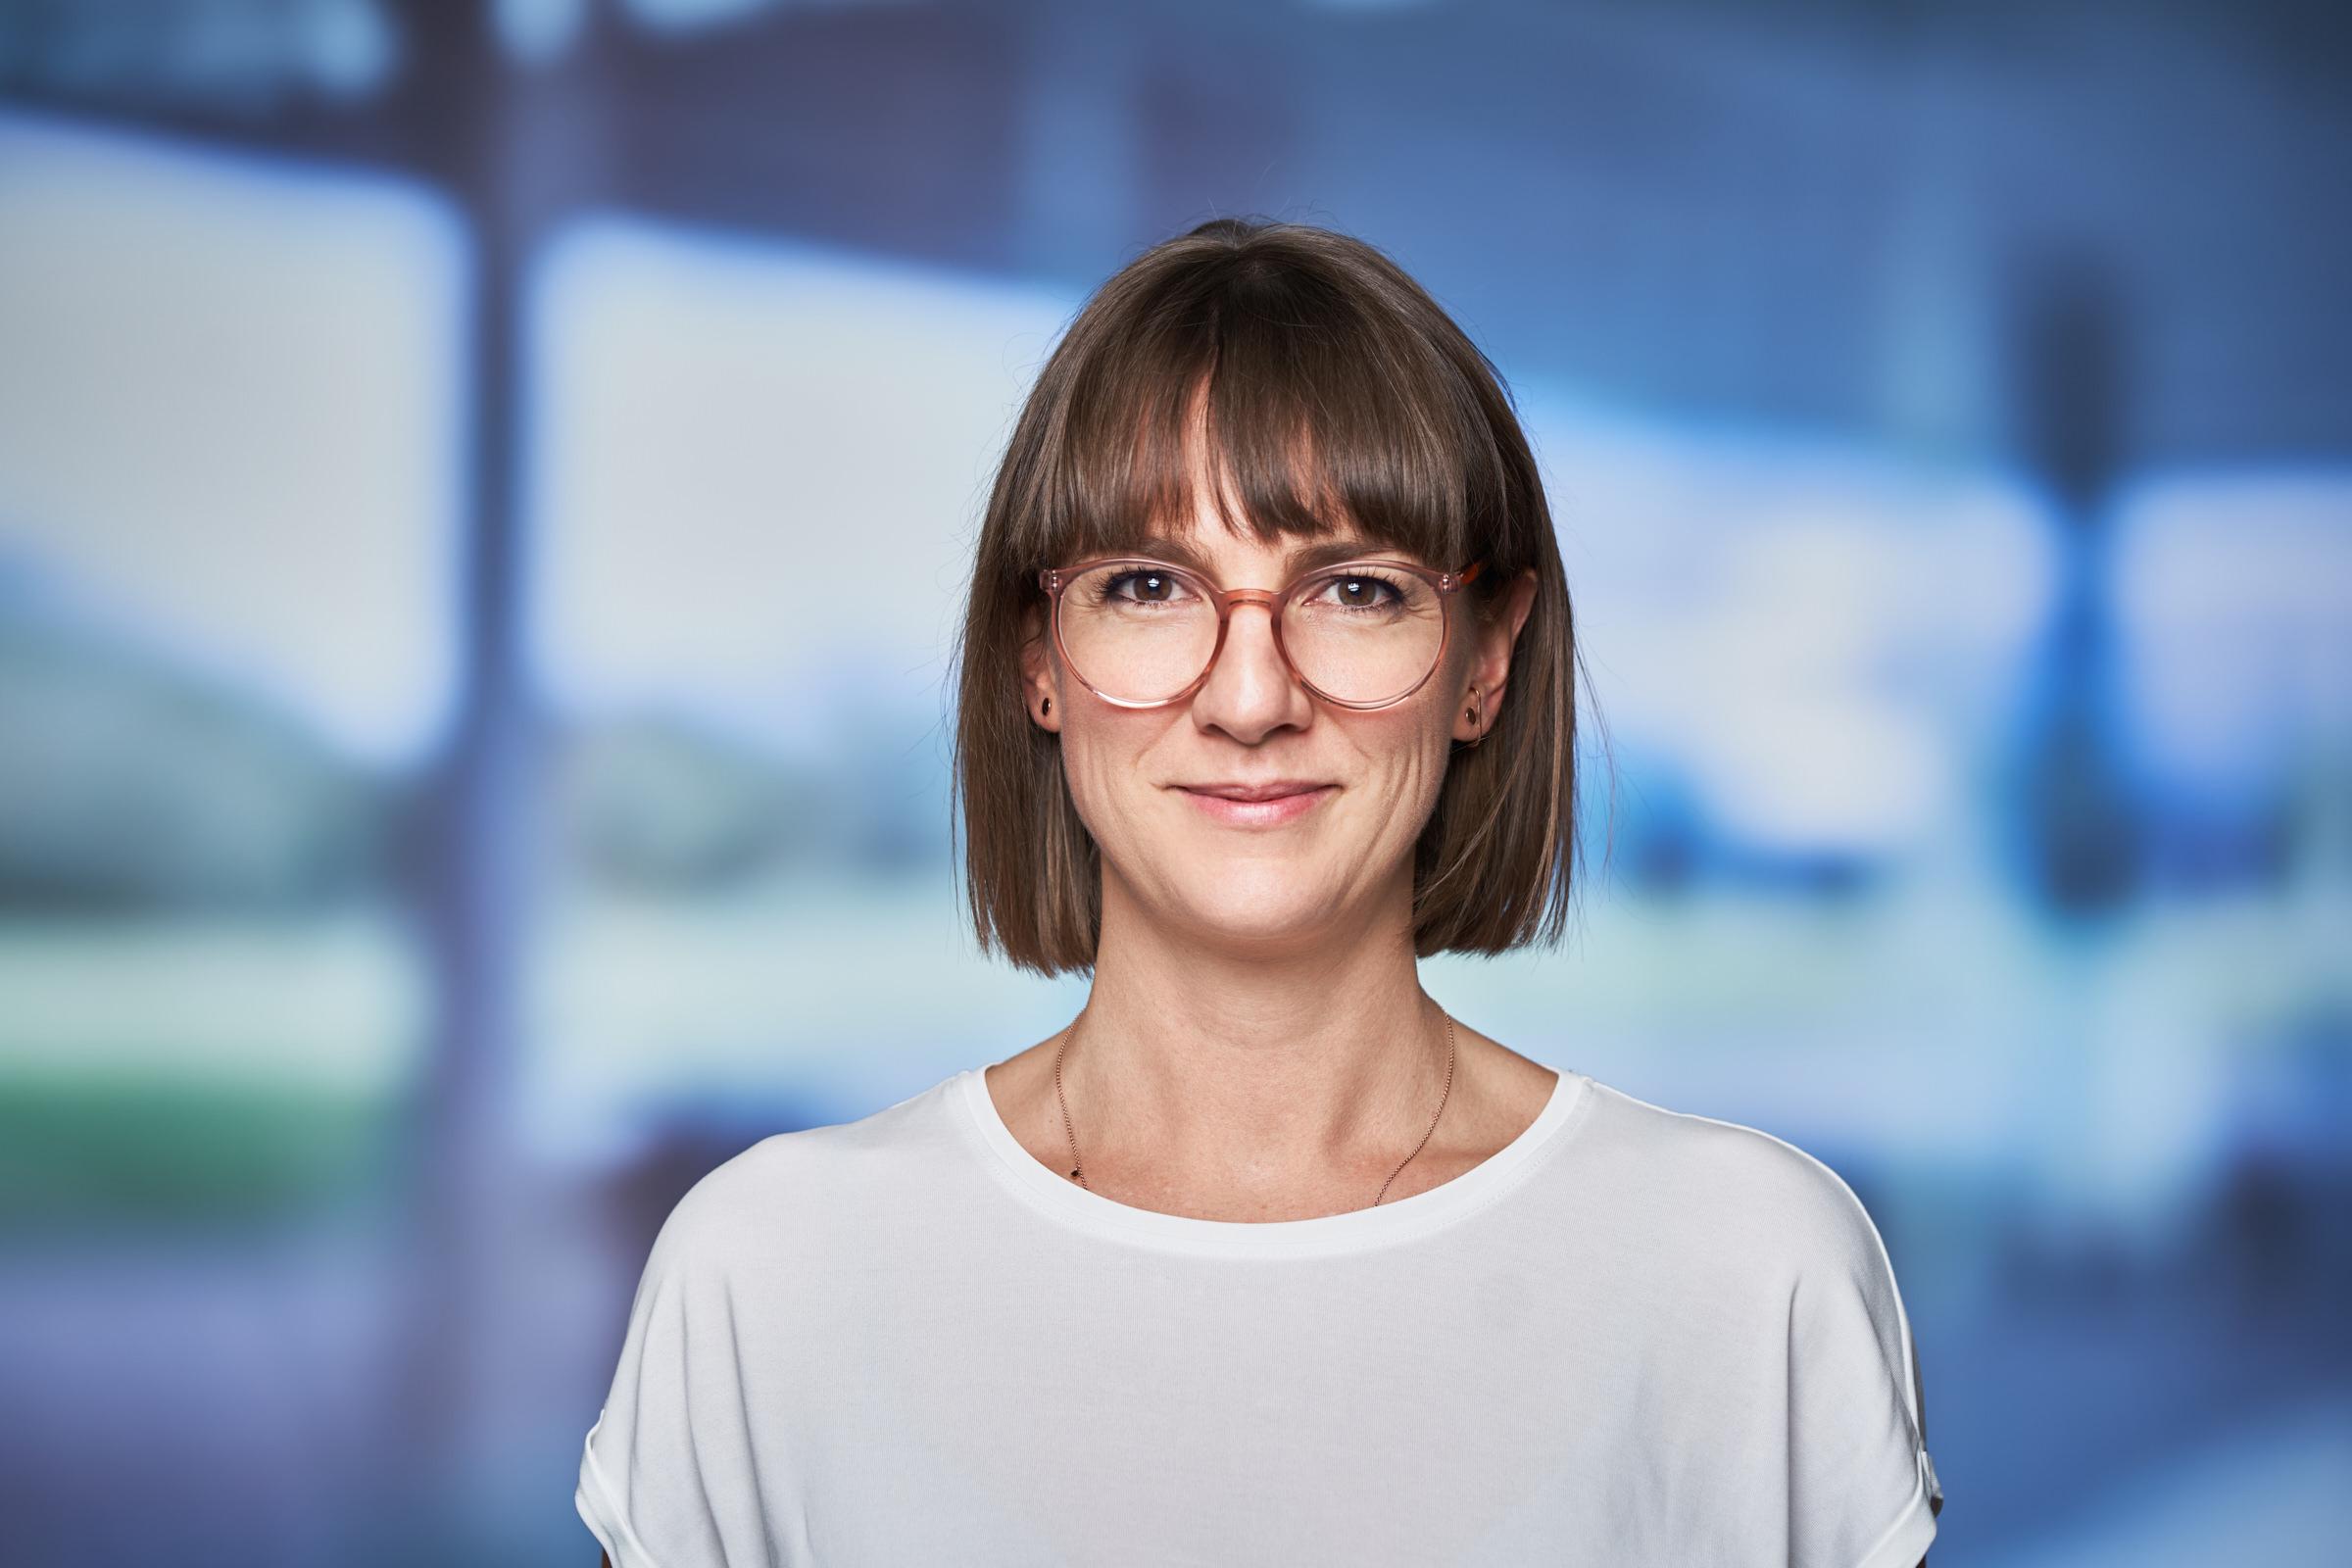 Picture of Johanna Rainer